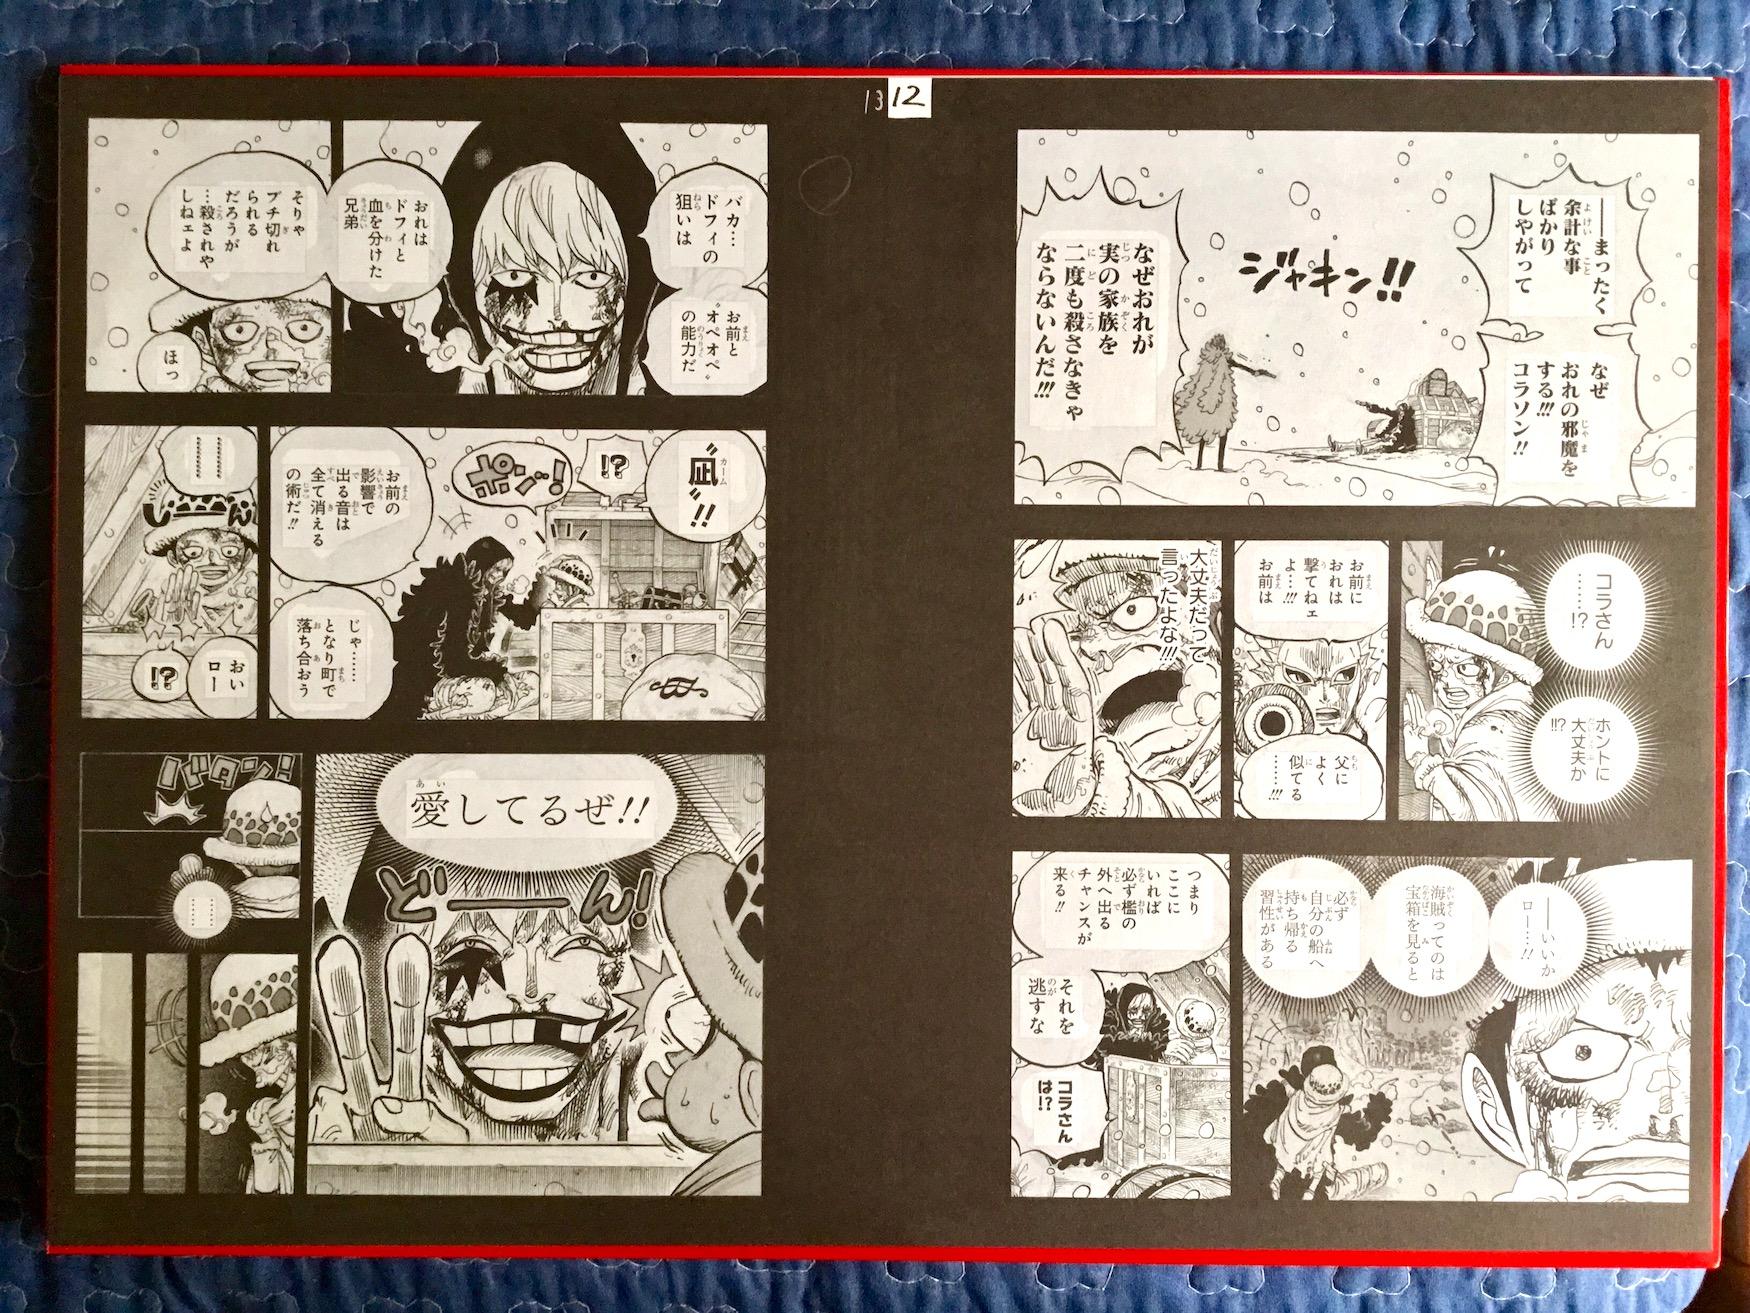 El manga de One Piece cumplió 20 años